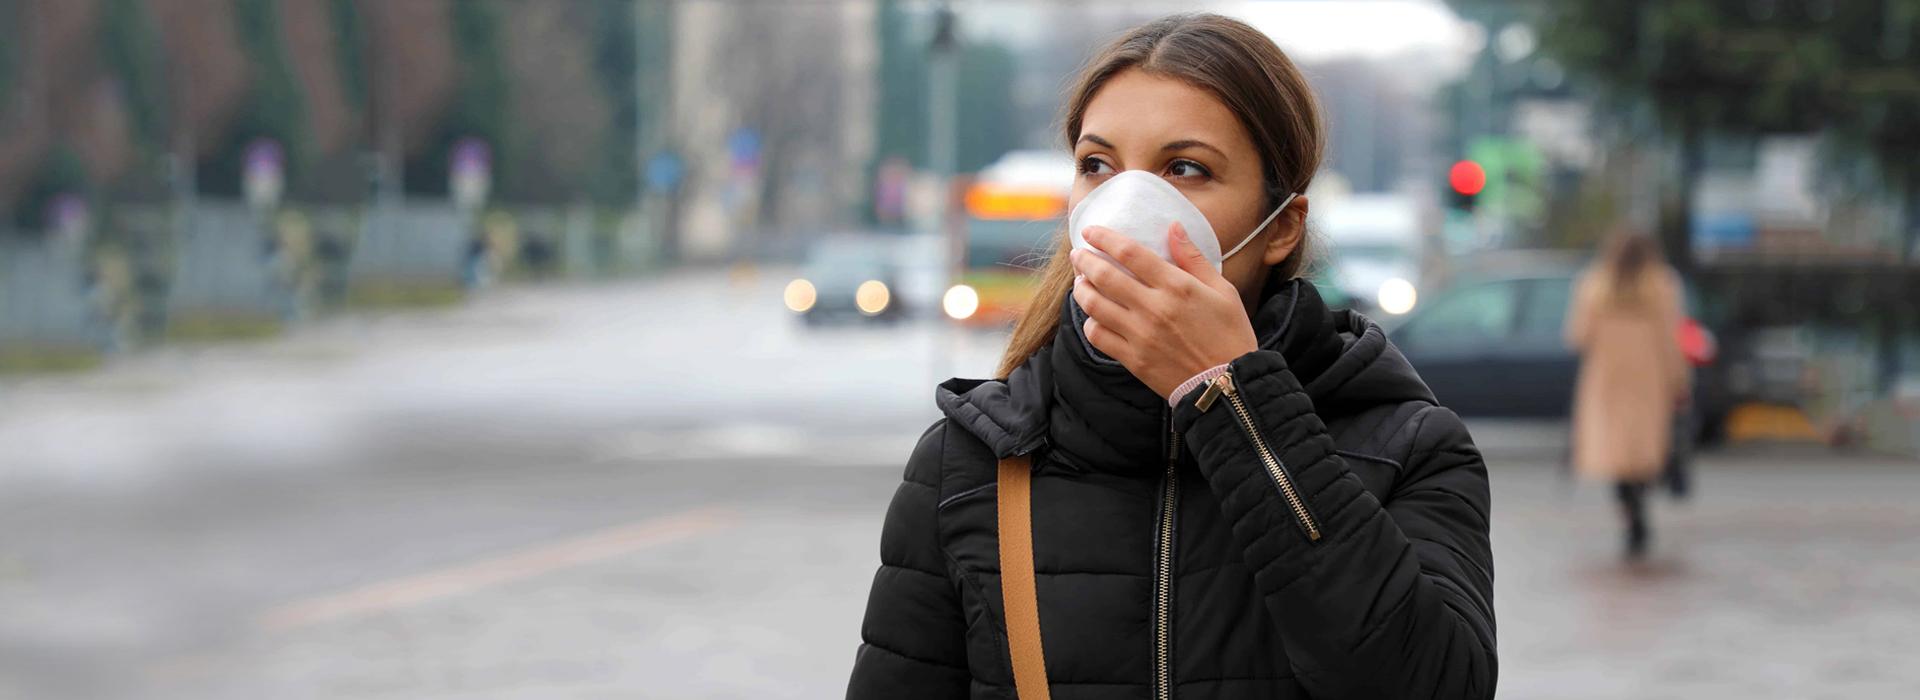 COVID-19 nasal swab testing